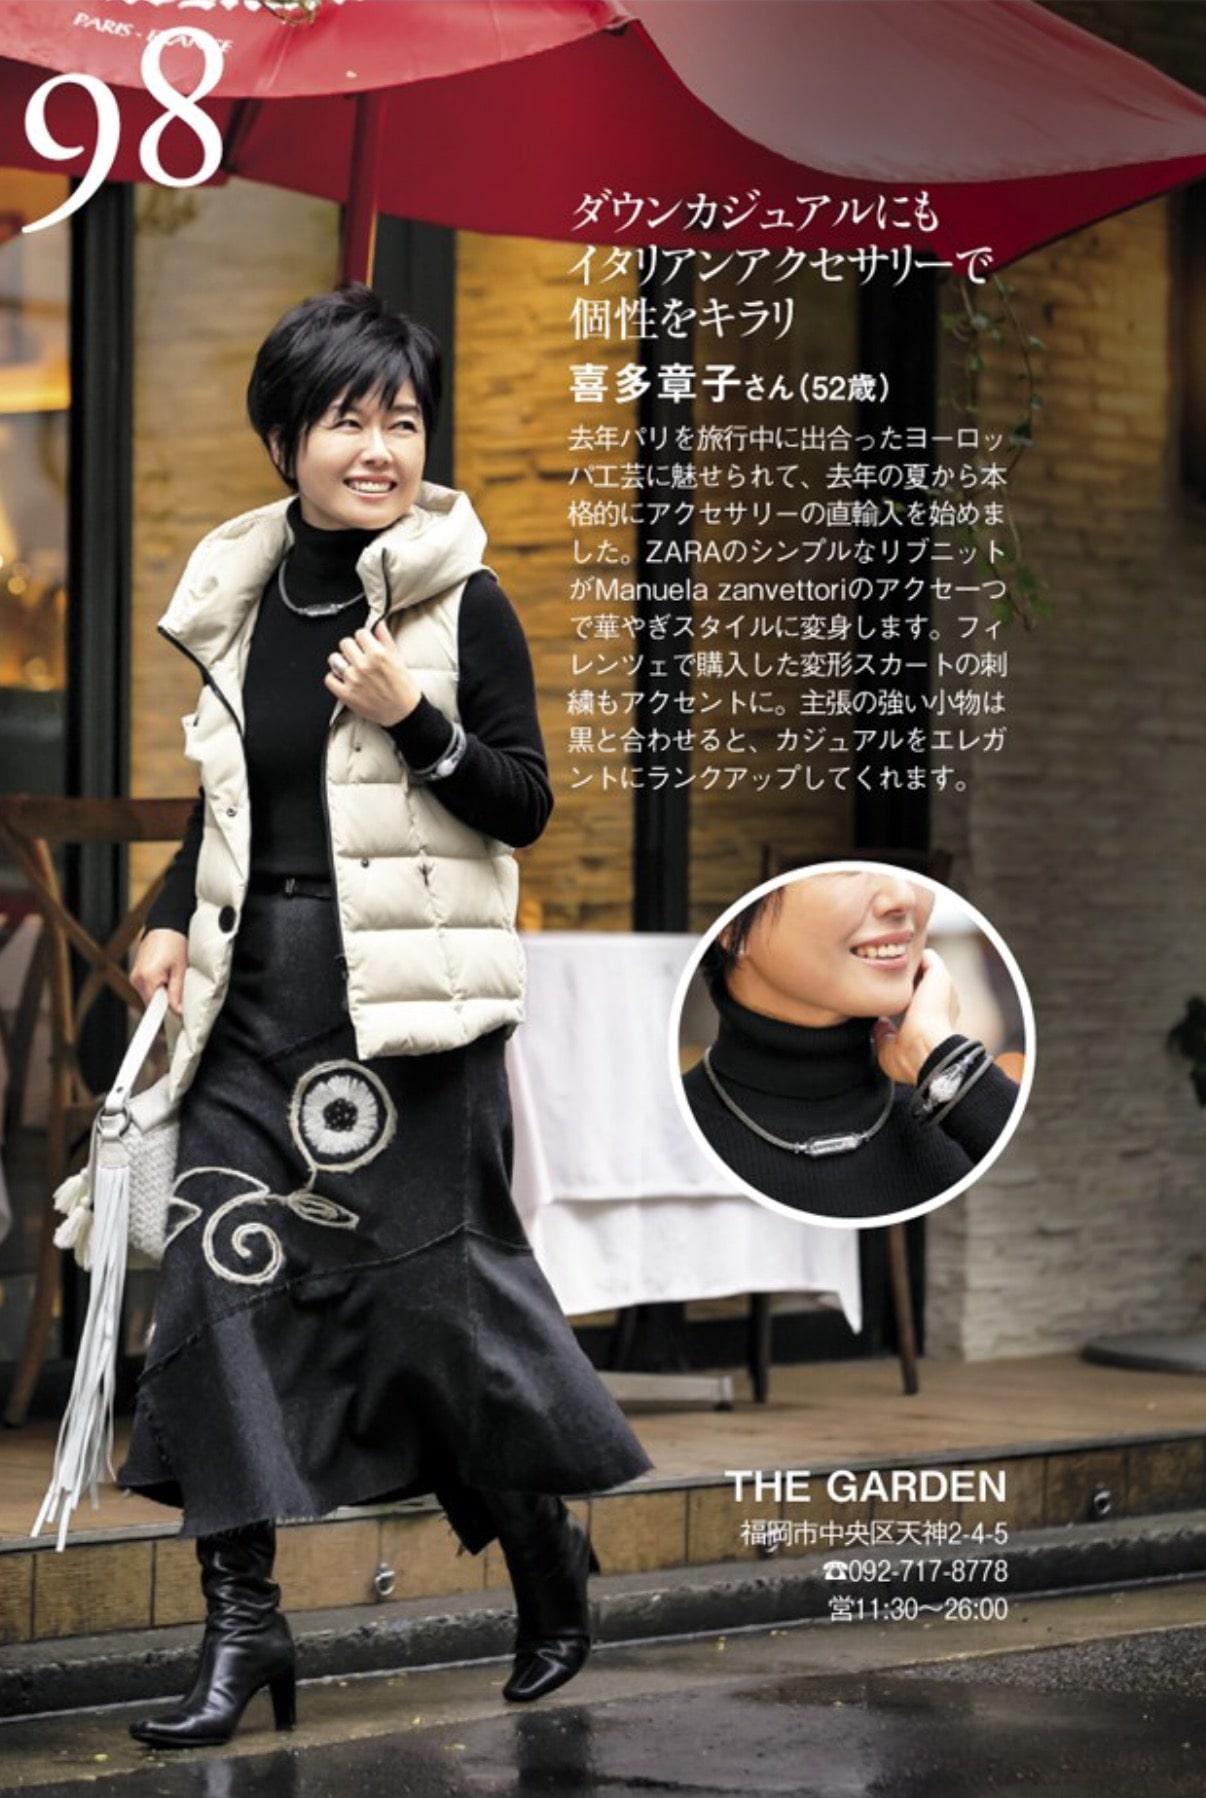 Japanese magazine Hers and Manuela Zanvettori